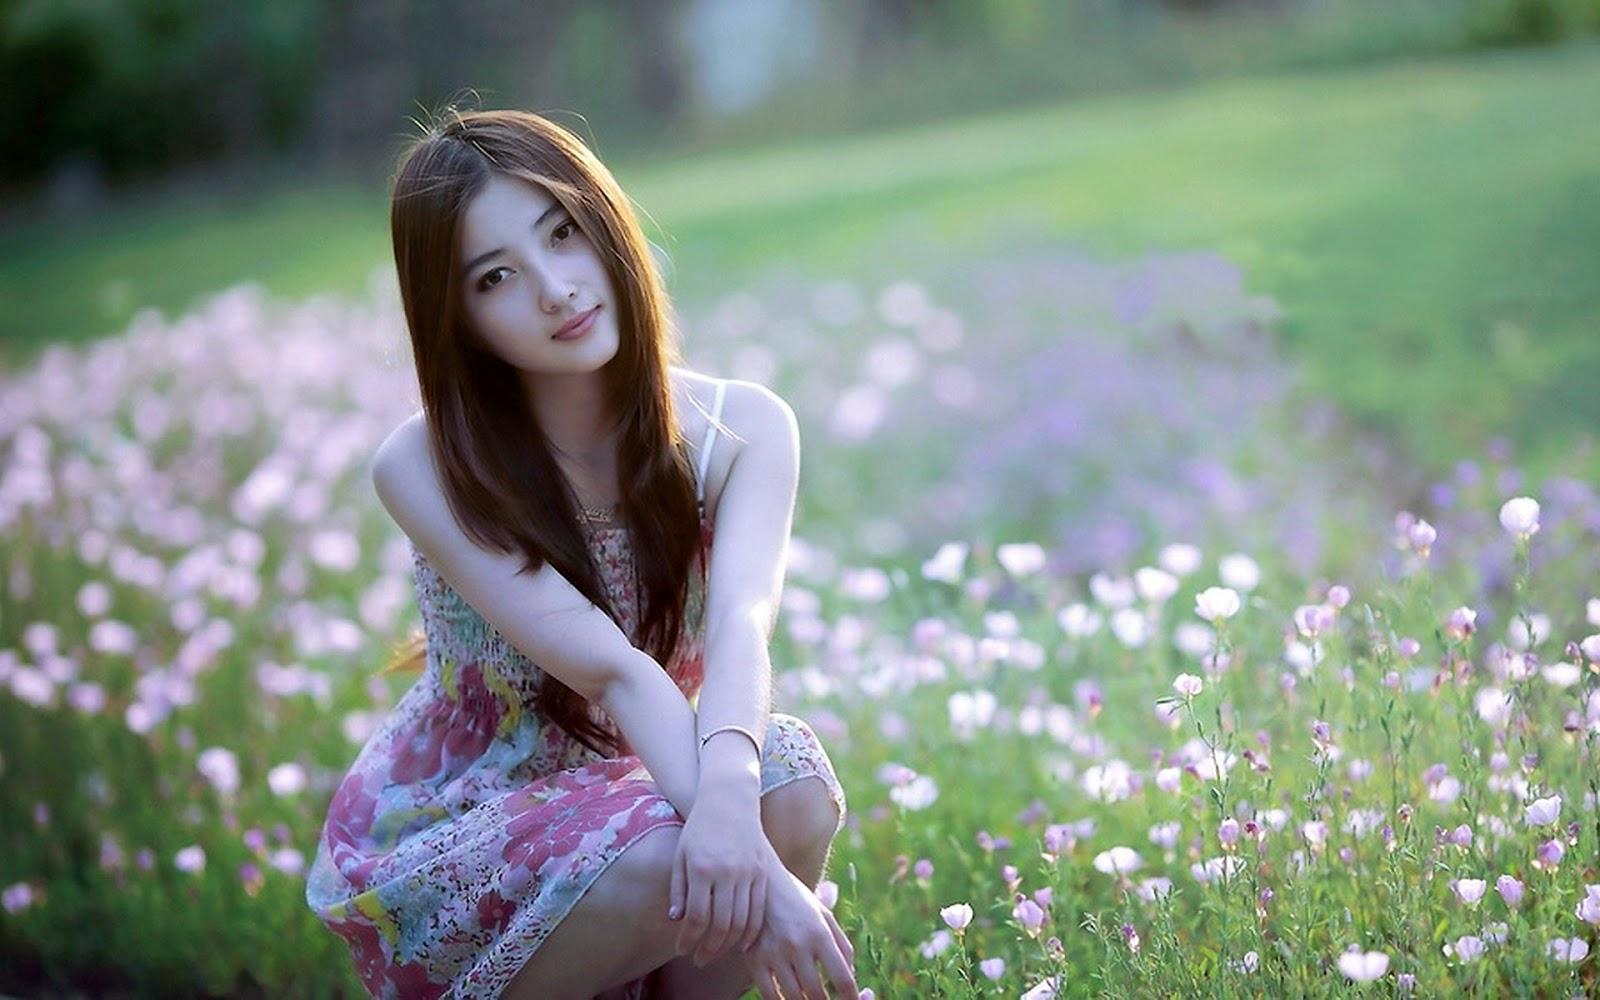 bo-anh-girl-xinh-quyen-ru-van-nguoi-me-h5.jpg